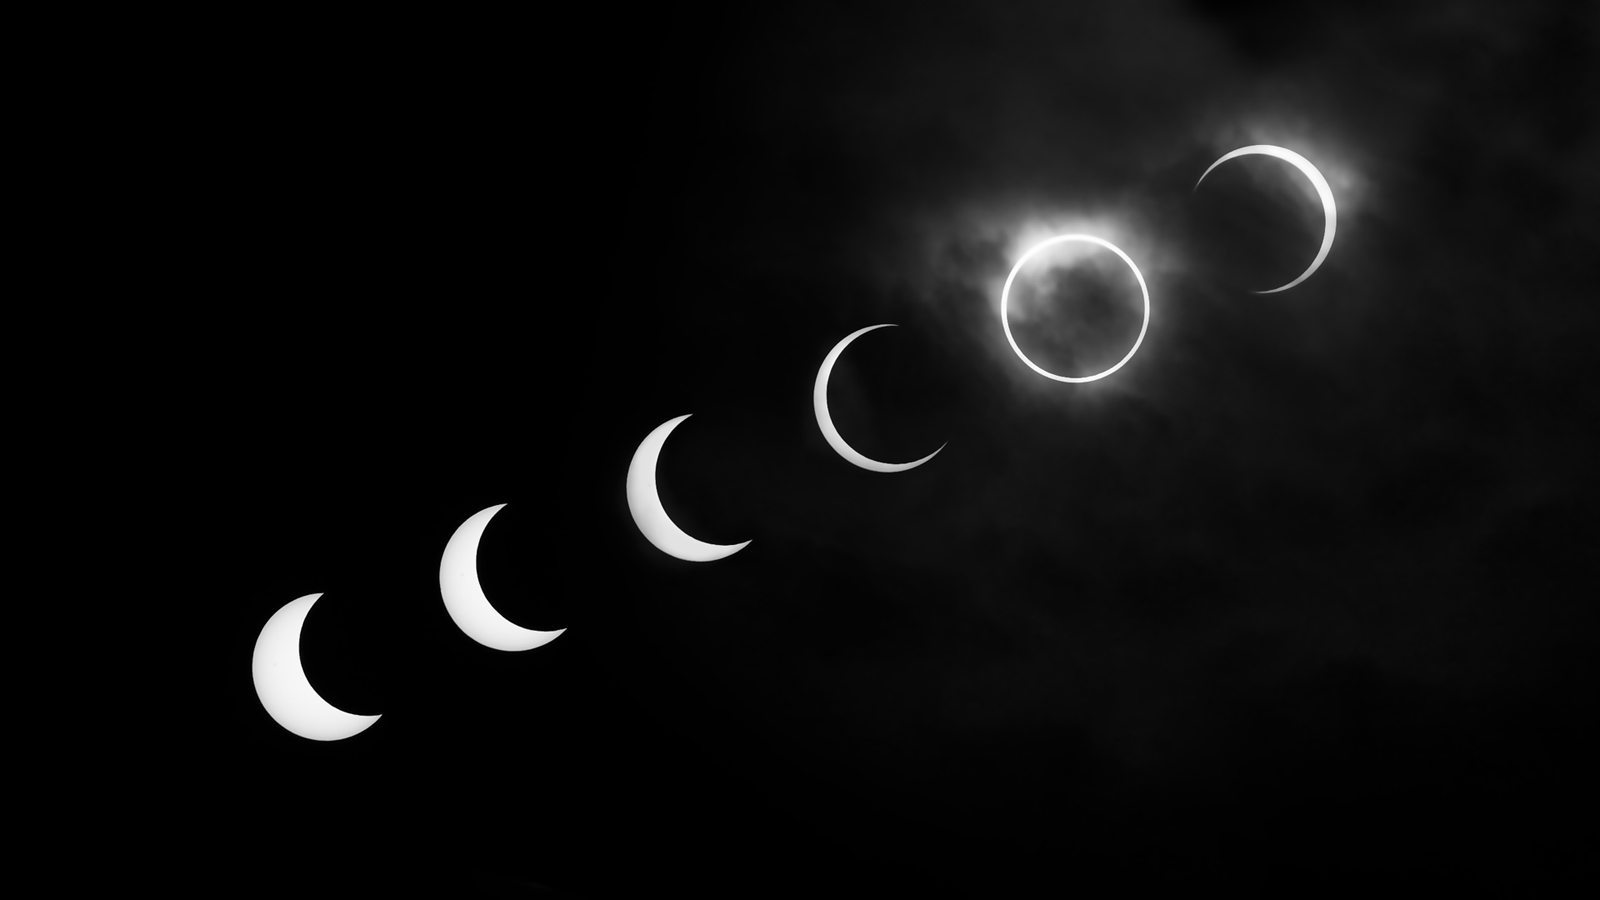 Solar eclipse black and white desktop wallpaper Black 1600x900